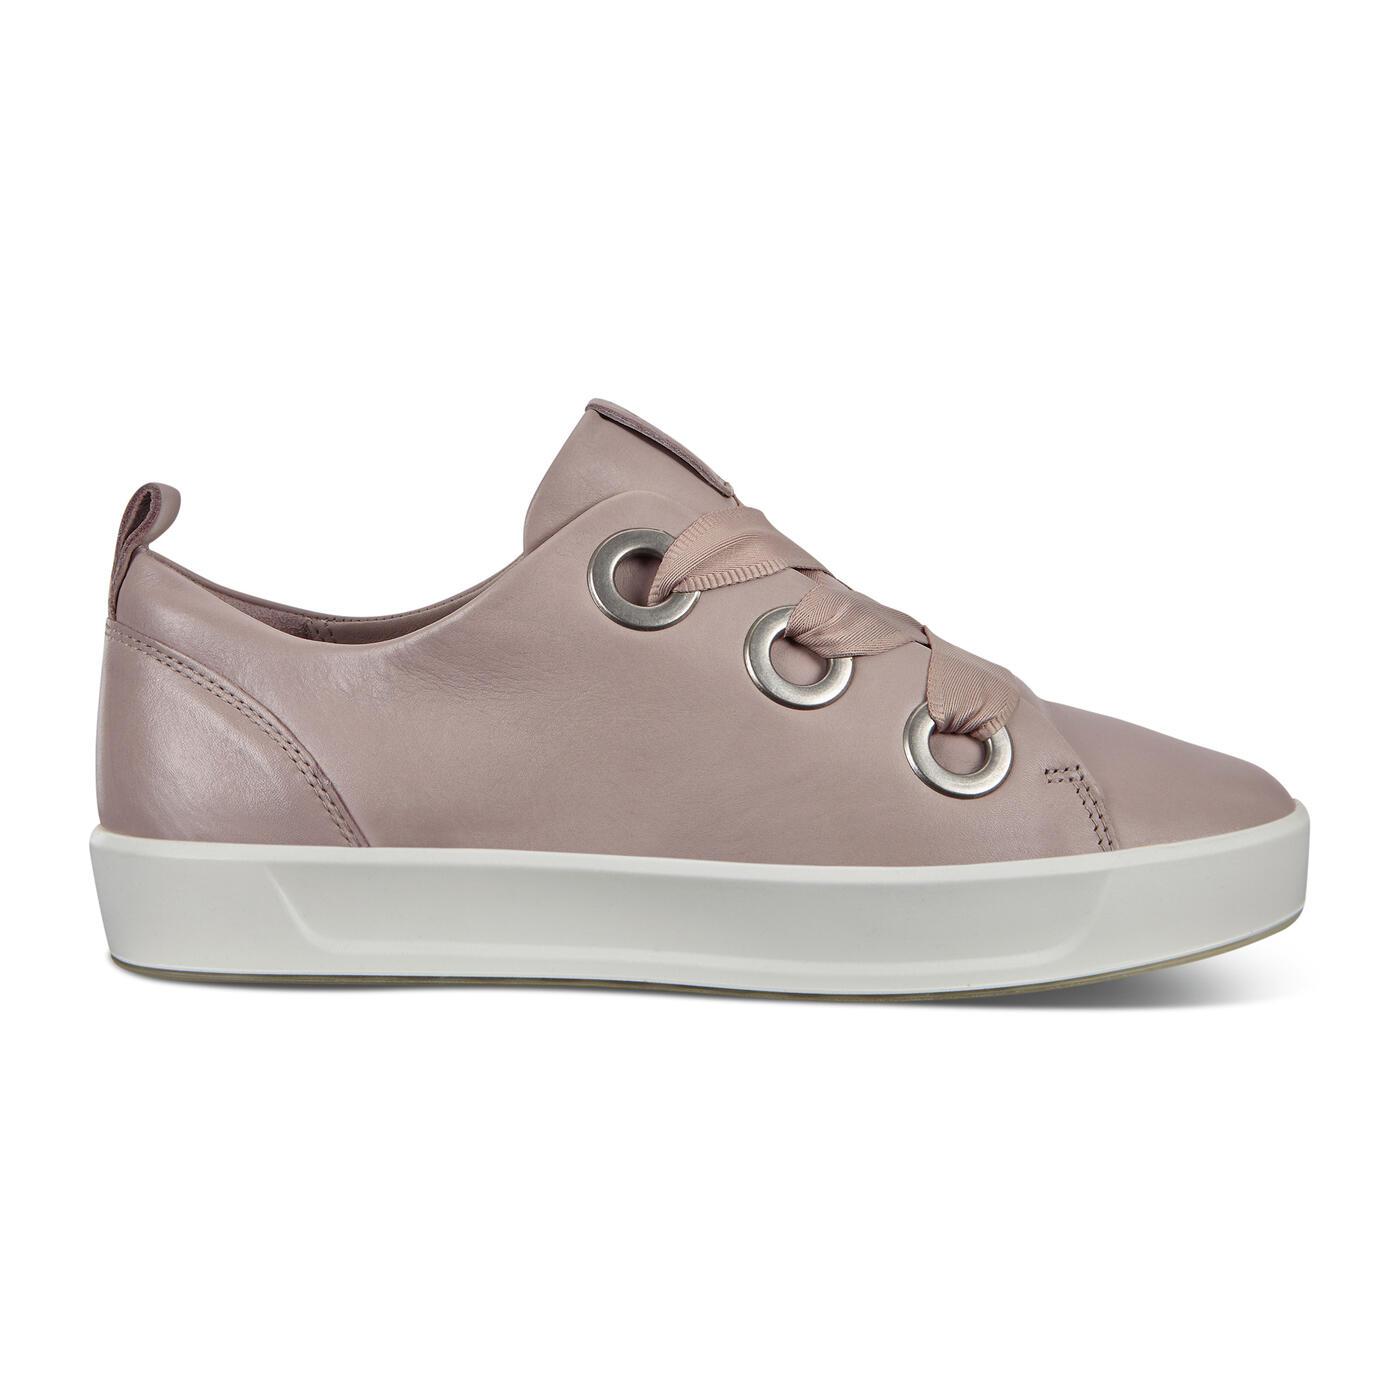 ECCO Soft 8 Women's 3-Eyelet Sneakers